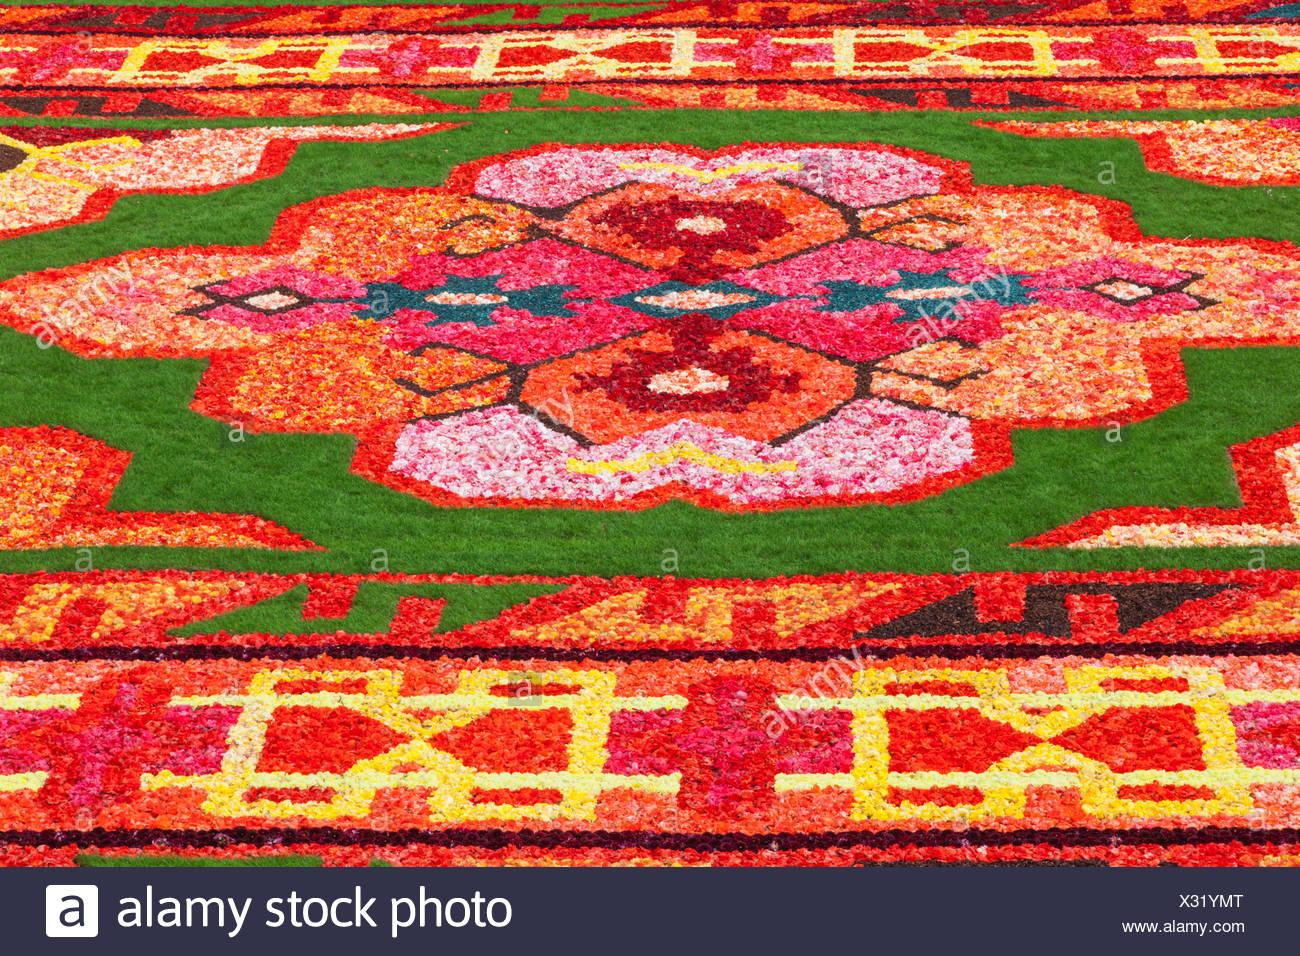 Belgium, Brussels, Grand Place, Flower Carpet Festival, Flower Pattern - Stock Image